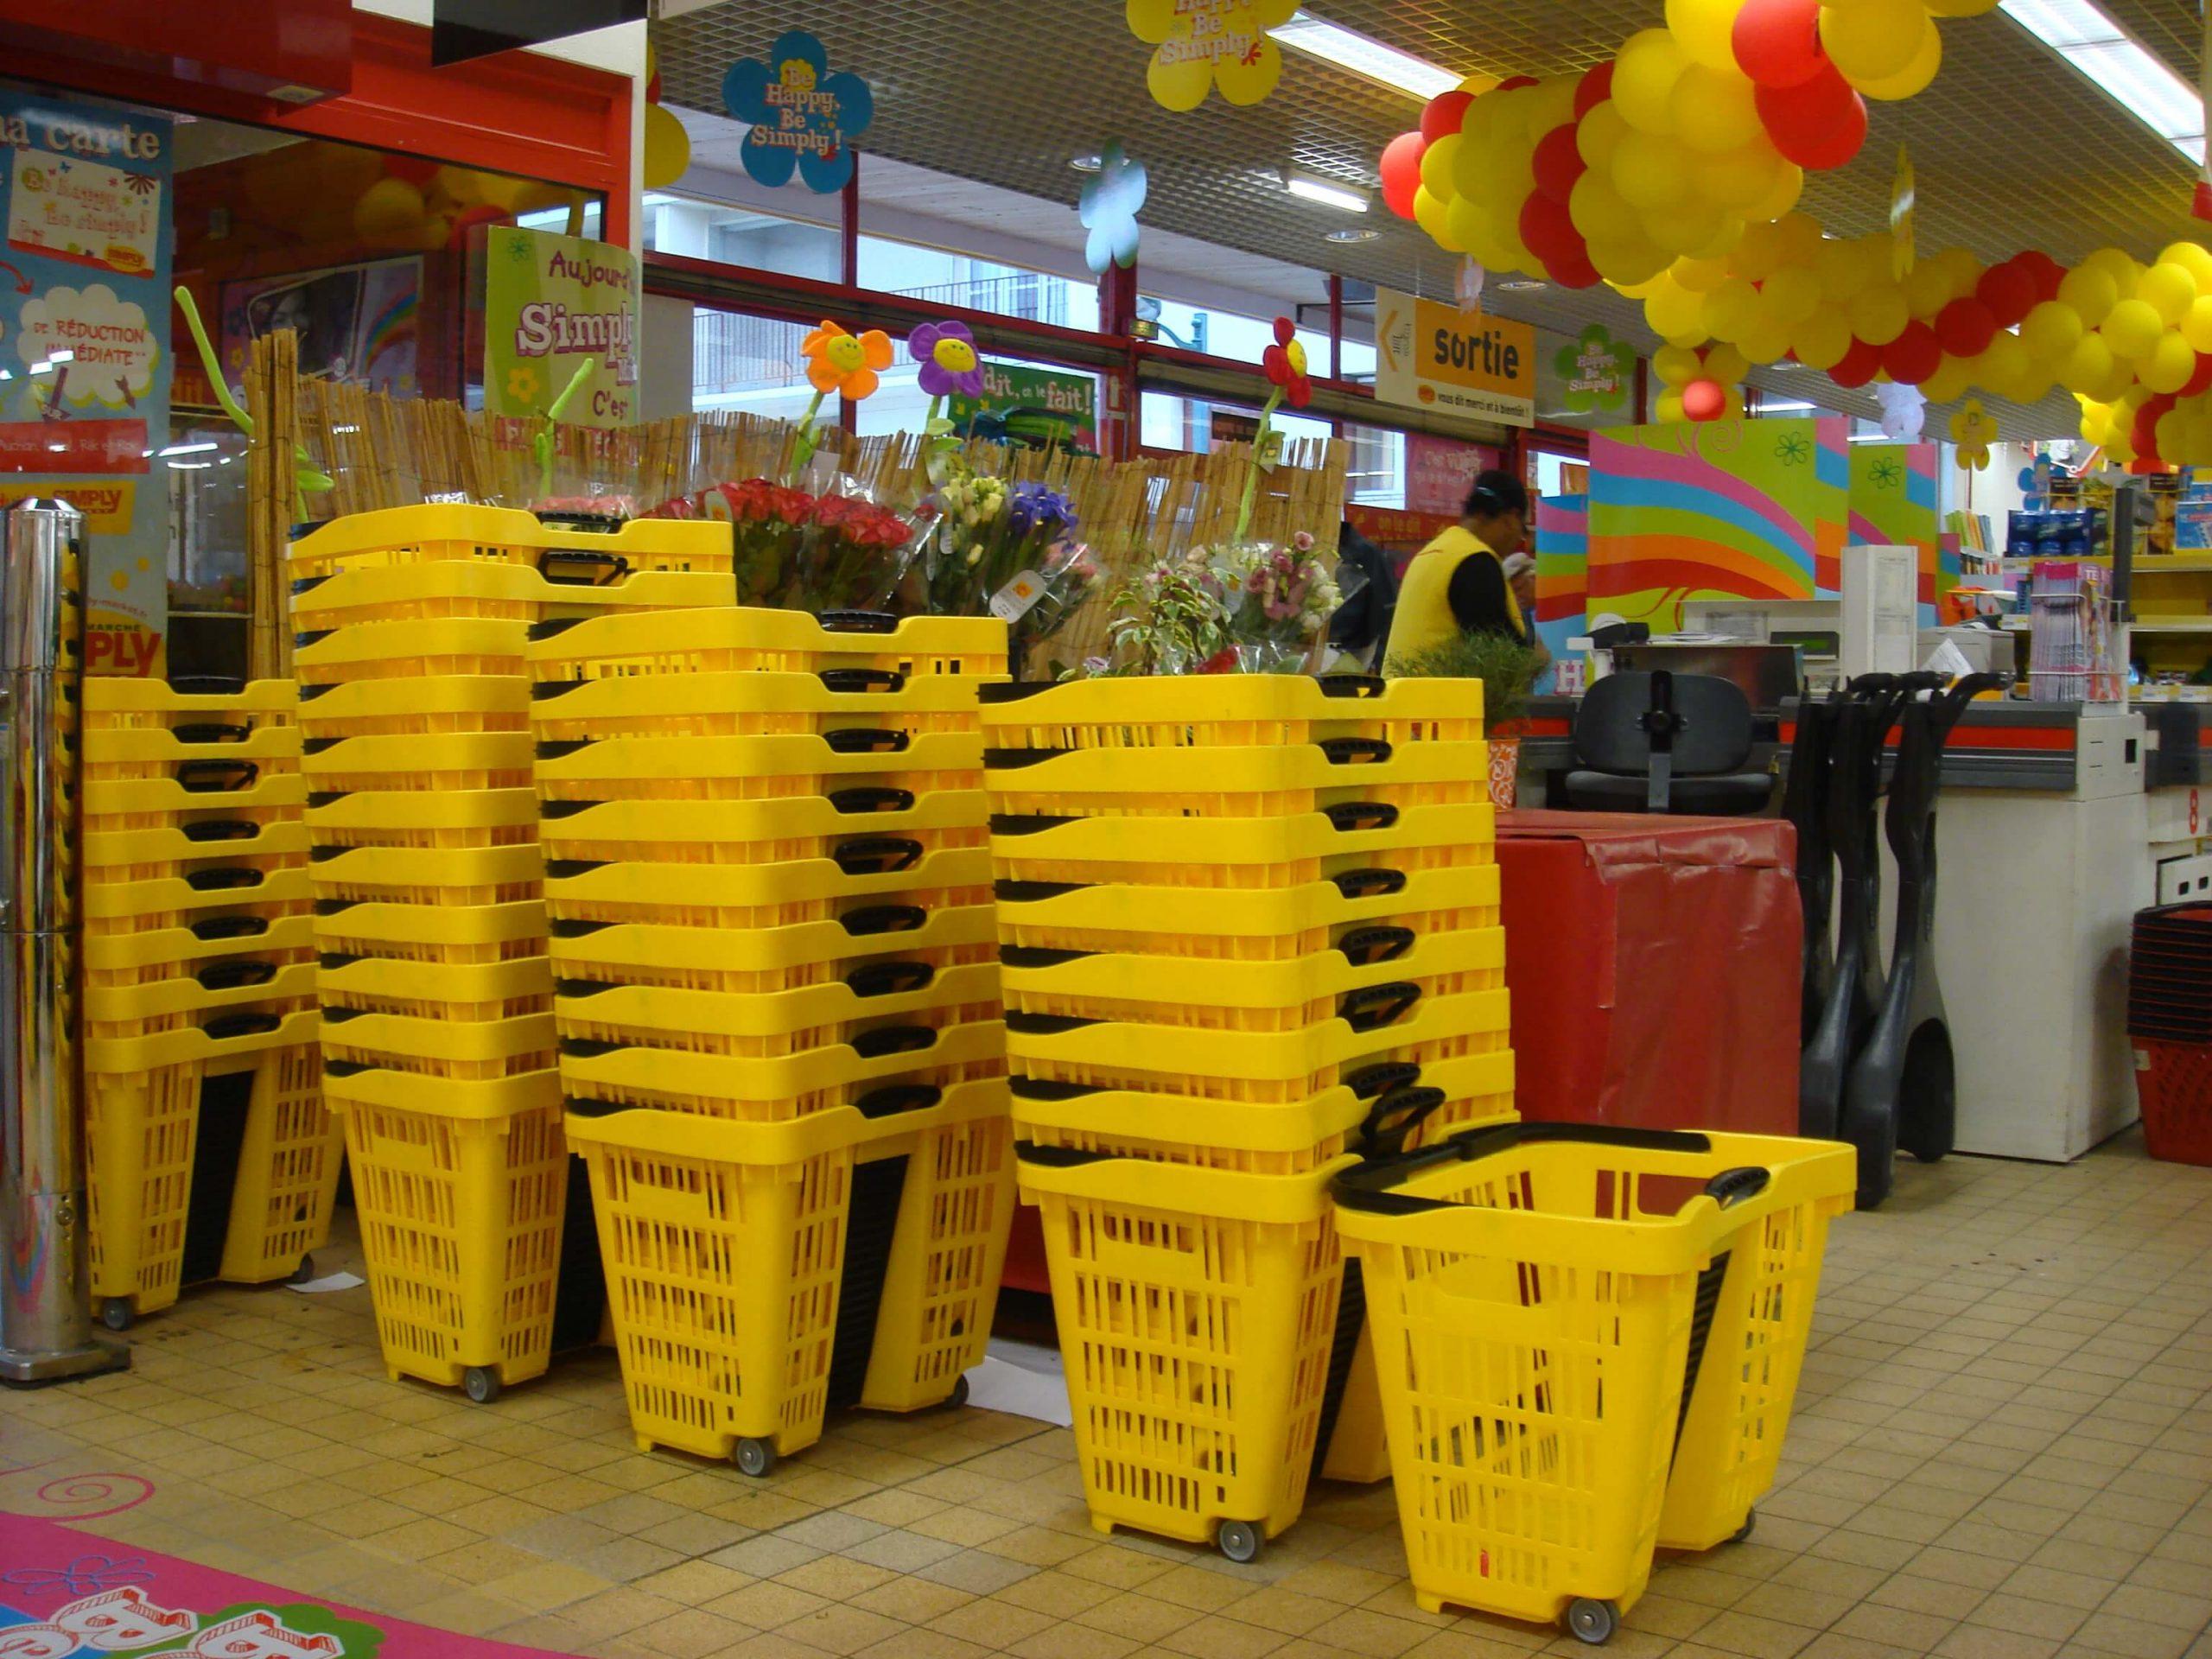 Speesy Supermarket Shopping Baskets Stacked